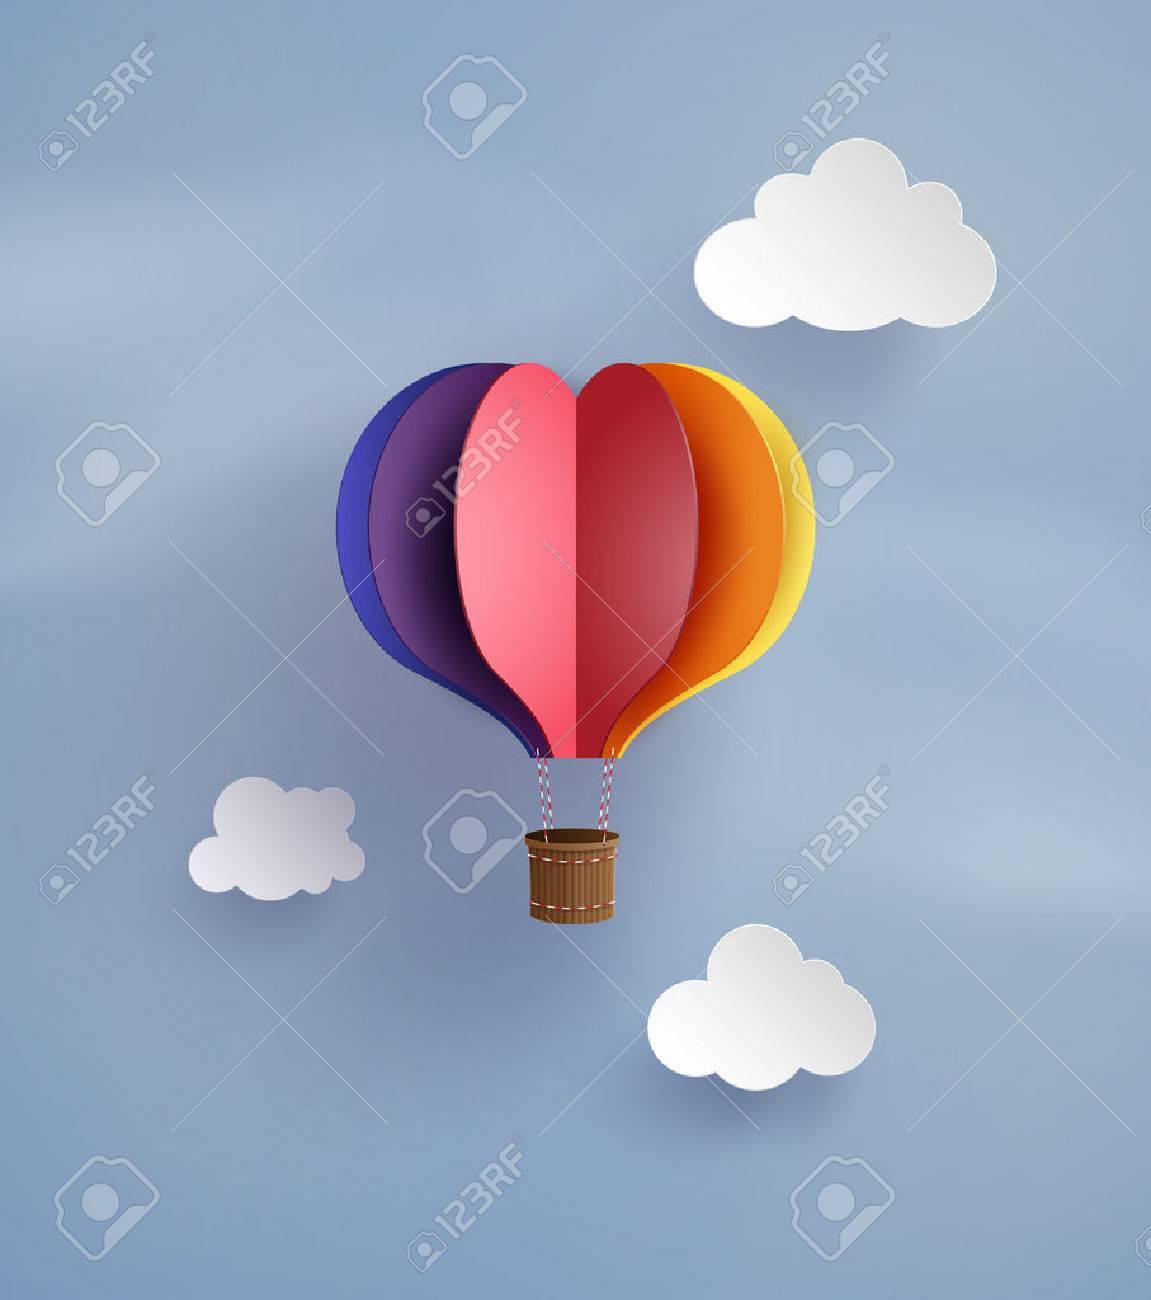 Origami made hot air balloon in a heart shape royalty free origami made hot air balloon in a heart shape stock vector 63619547 jeuxipadfo Choice Image